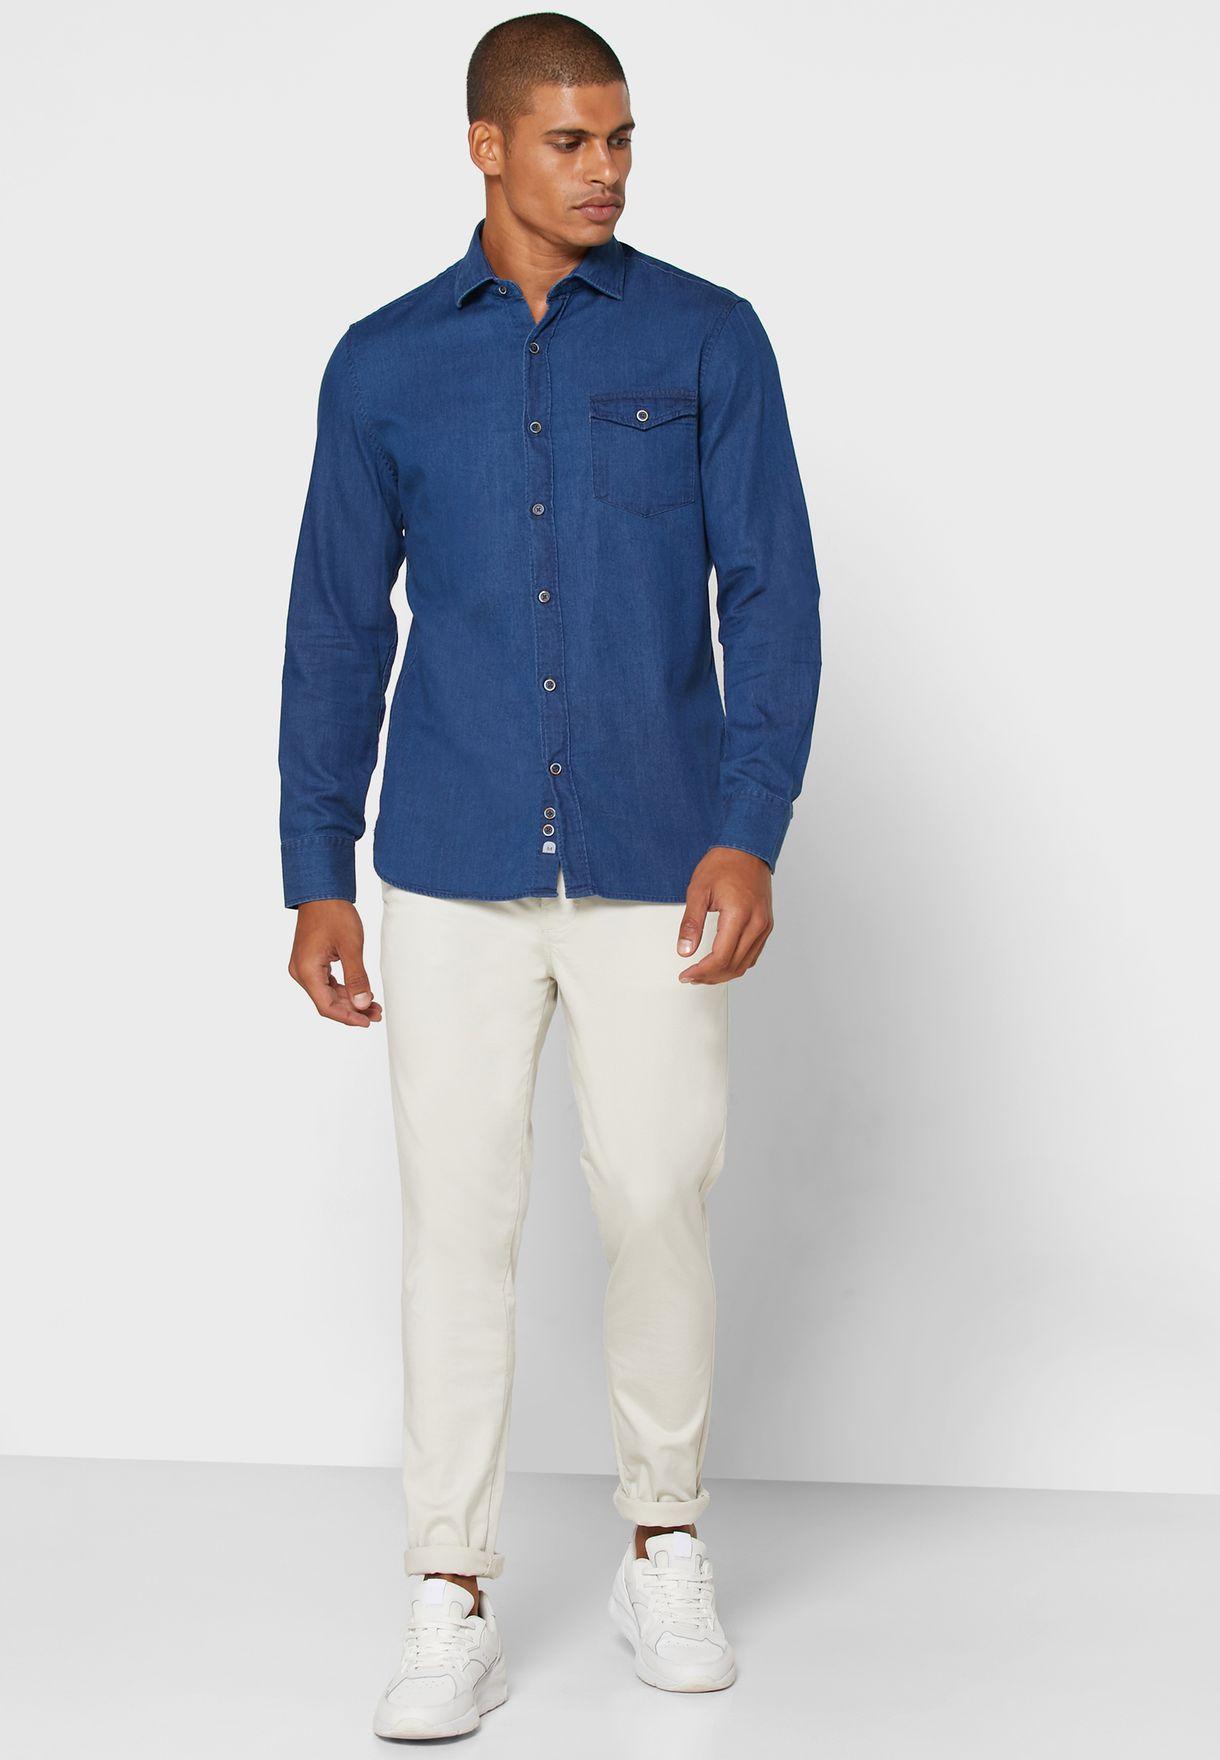 قميص جينز بقصة سلم فت